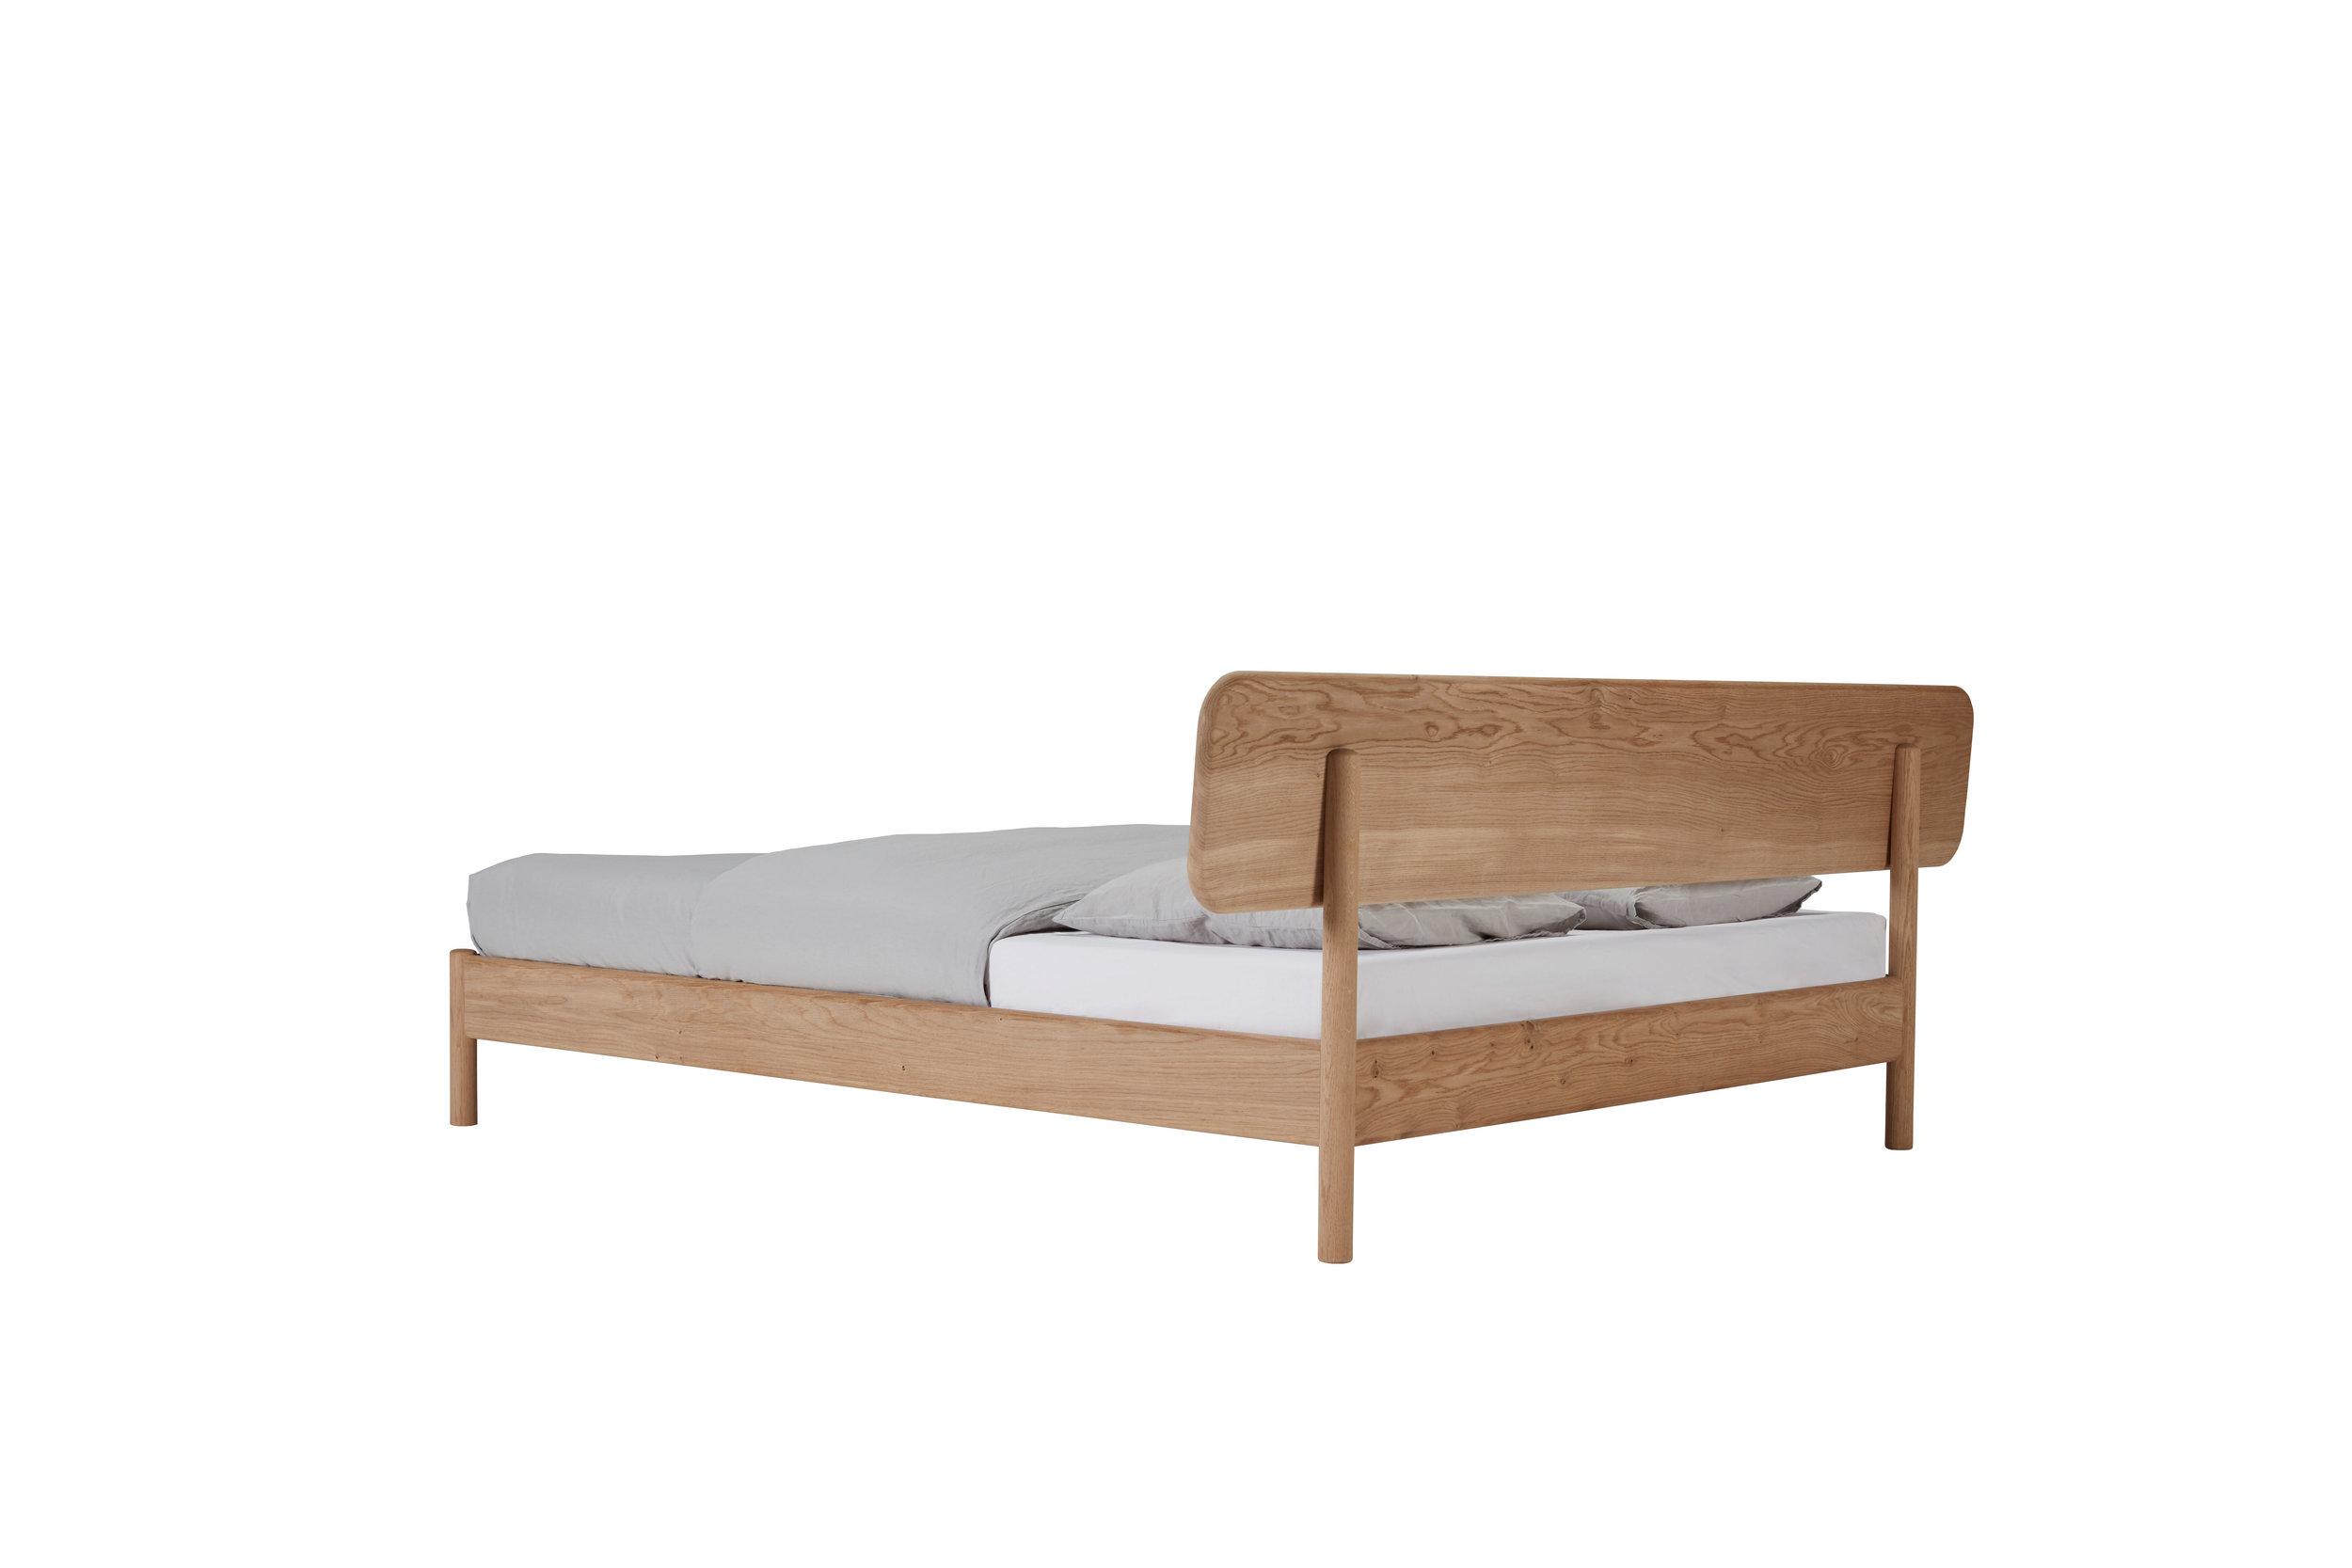 2.4---ALKEN-BED---RE-BEDS---DESIGN-BY-OLIVER-&-LUKAS-WEISSKROGH.jpg